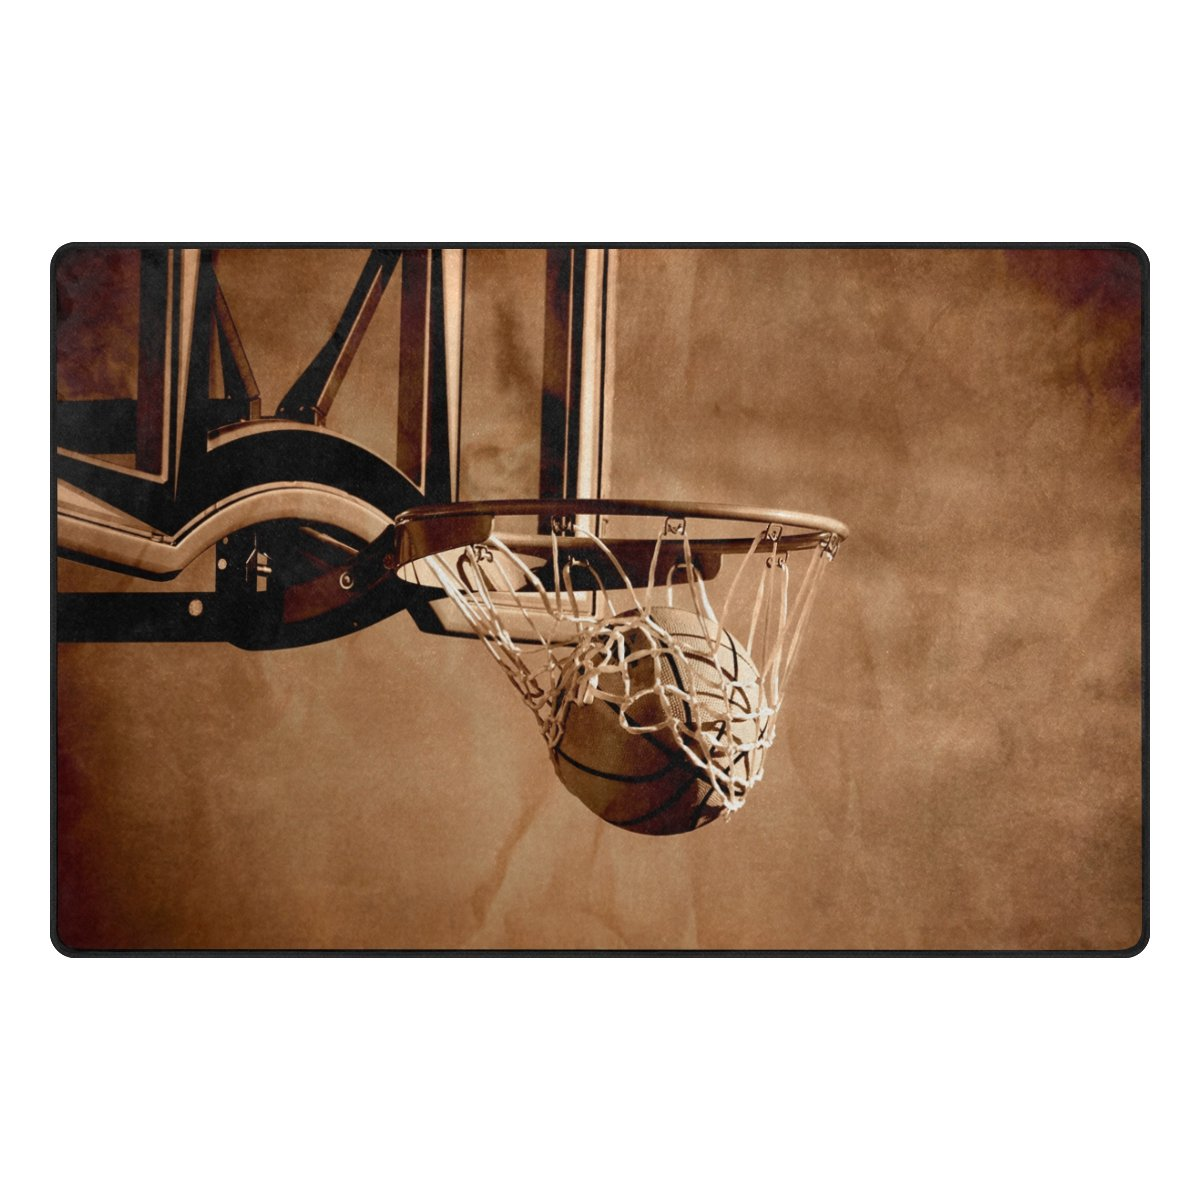 Benni giry Rango de baloncesto Alfombra antideslizante Diario de DF920felpudos para salón dormitorio 78,7x 50,8cm, poliéster, multicolor, 31 x 20 inch